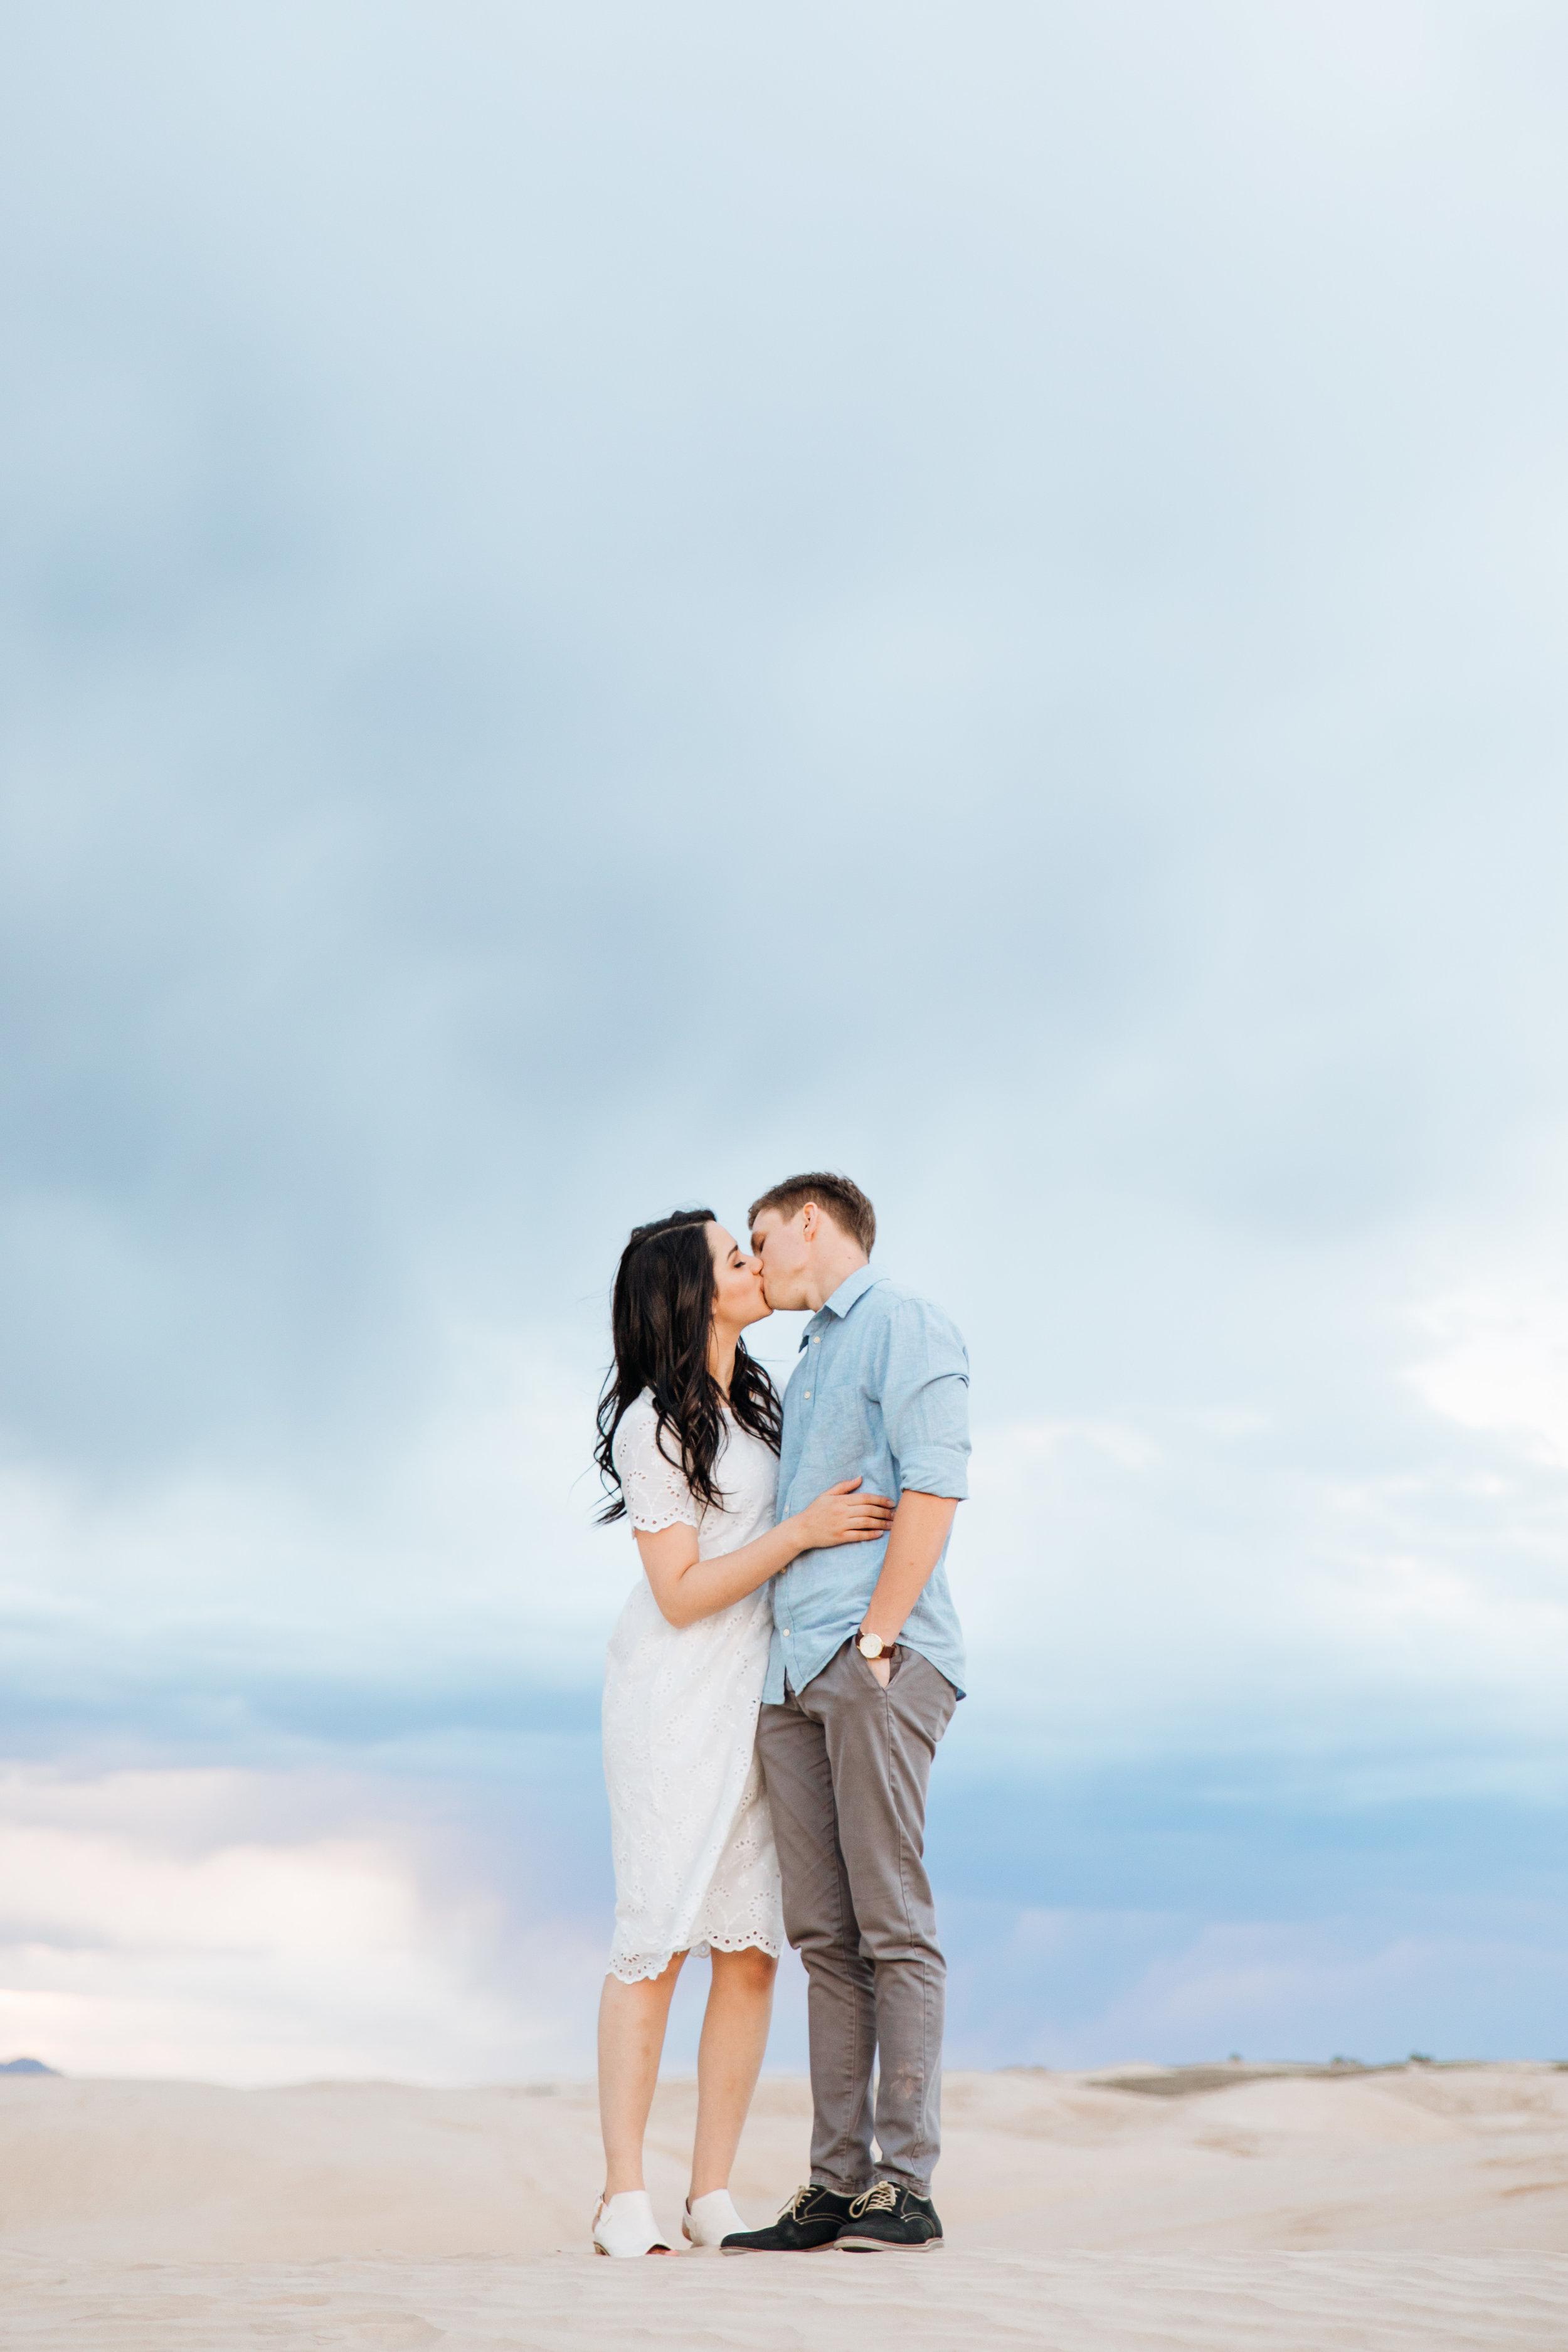 little-sahara-recreation-area-elopement-engagement-wedding-photography-michael-cozzens-85.jpg